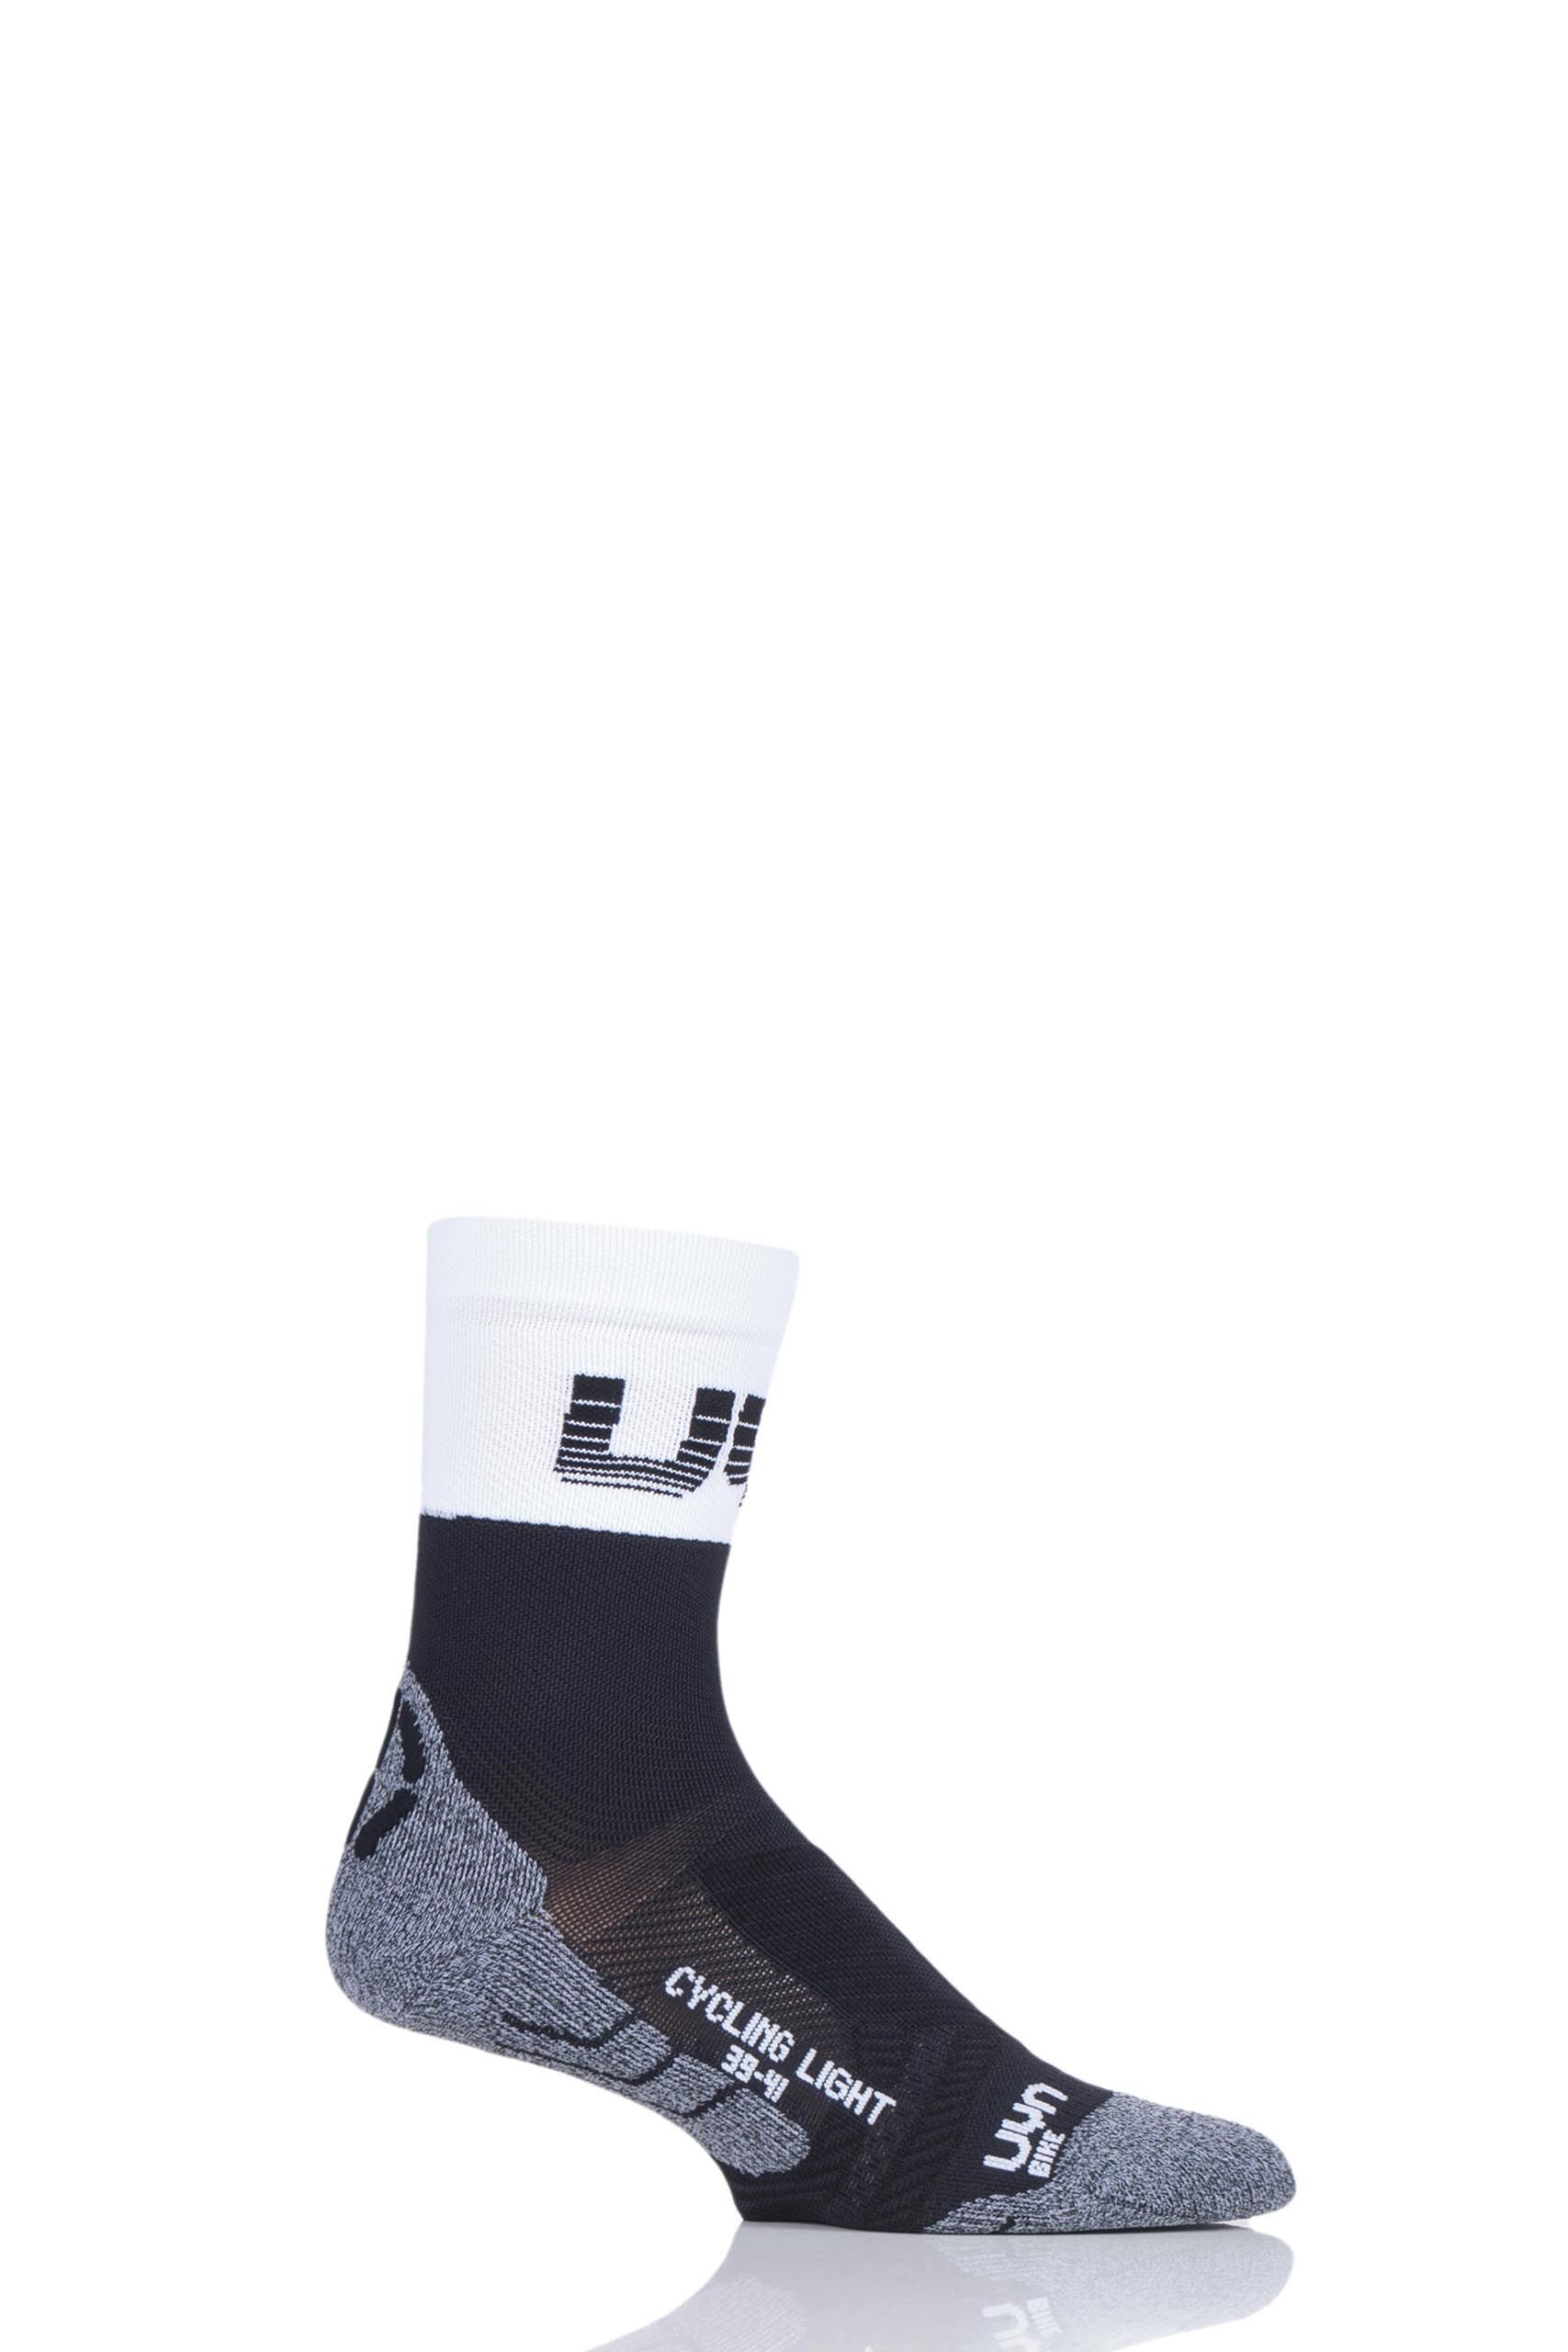 Image of 1 Pair Black Cycling Light Weight Socks Men's 3-5.5 Mens - UYN